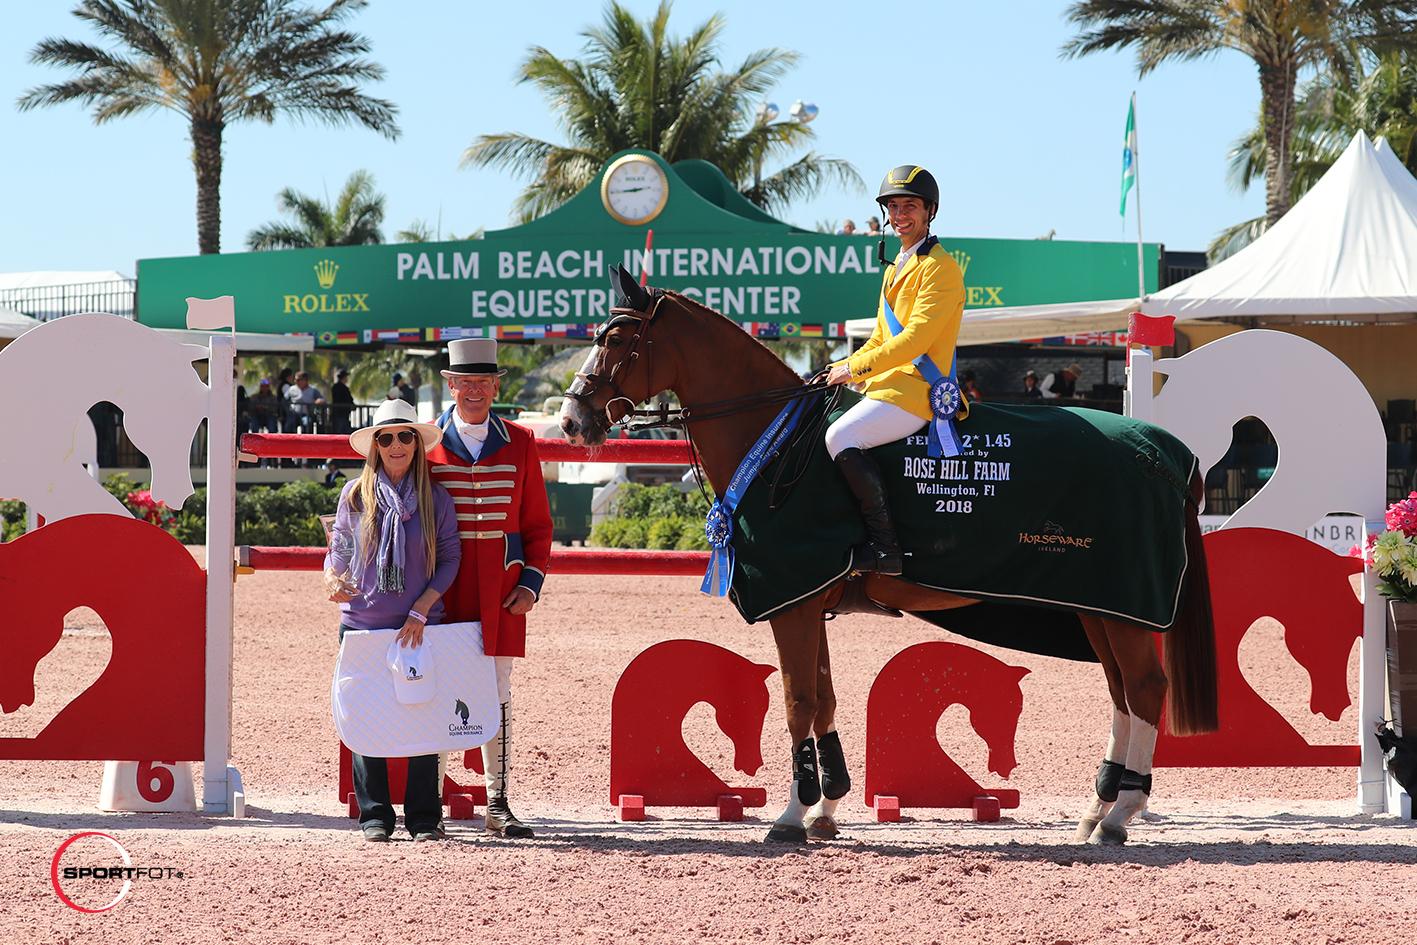 Yuri Mansur and Babylotte Jumper Style Award pres 317_7349 Sportfot